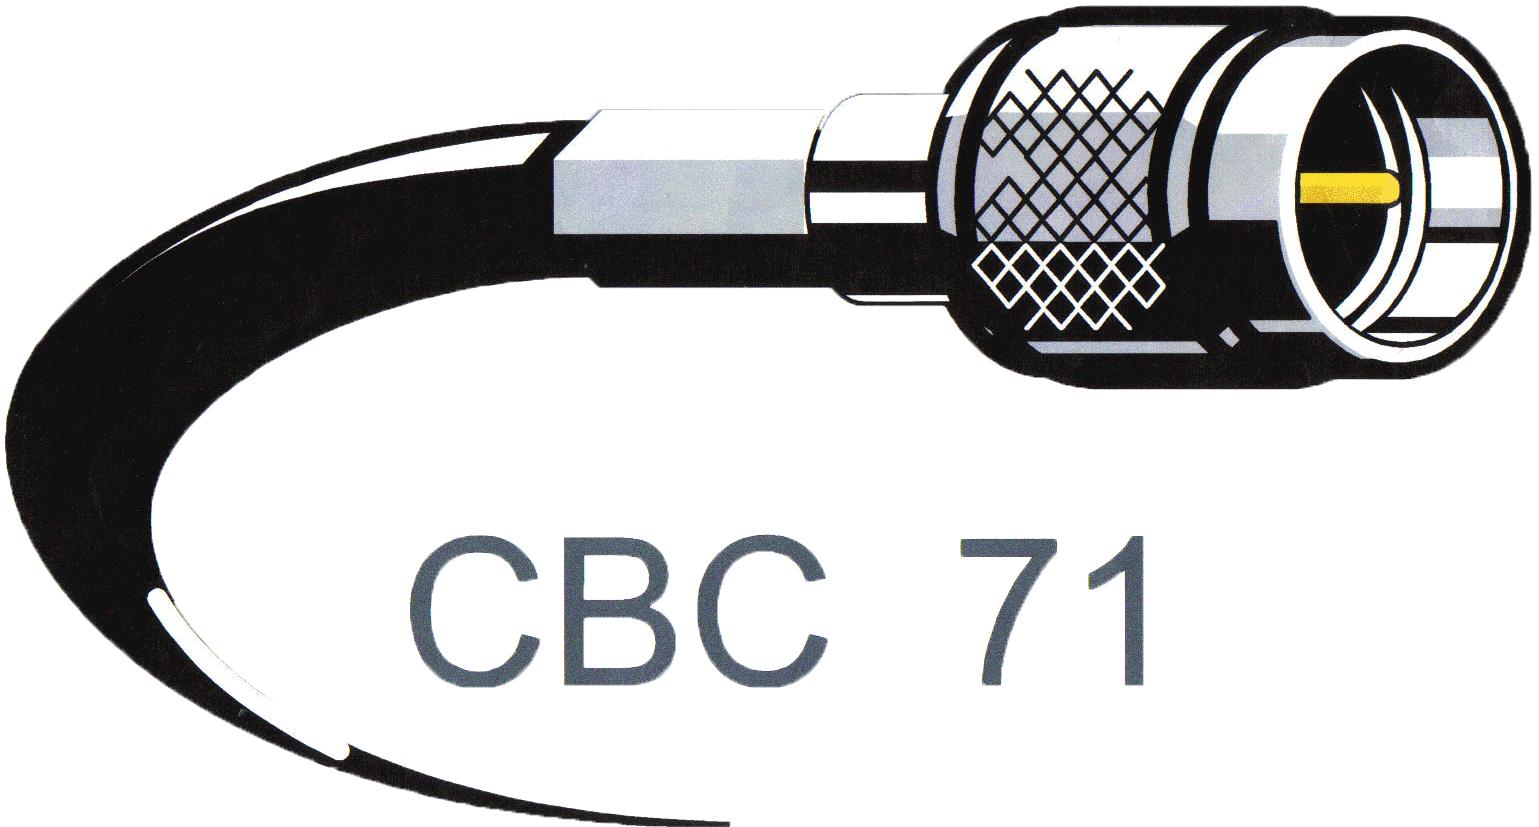 Citizen Band Club 71